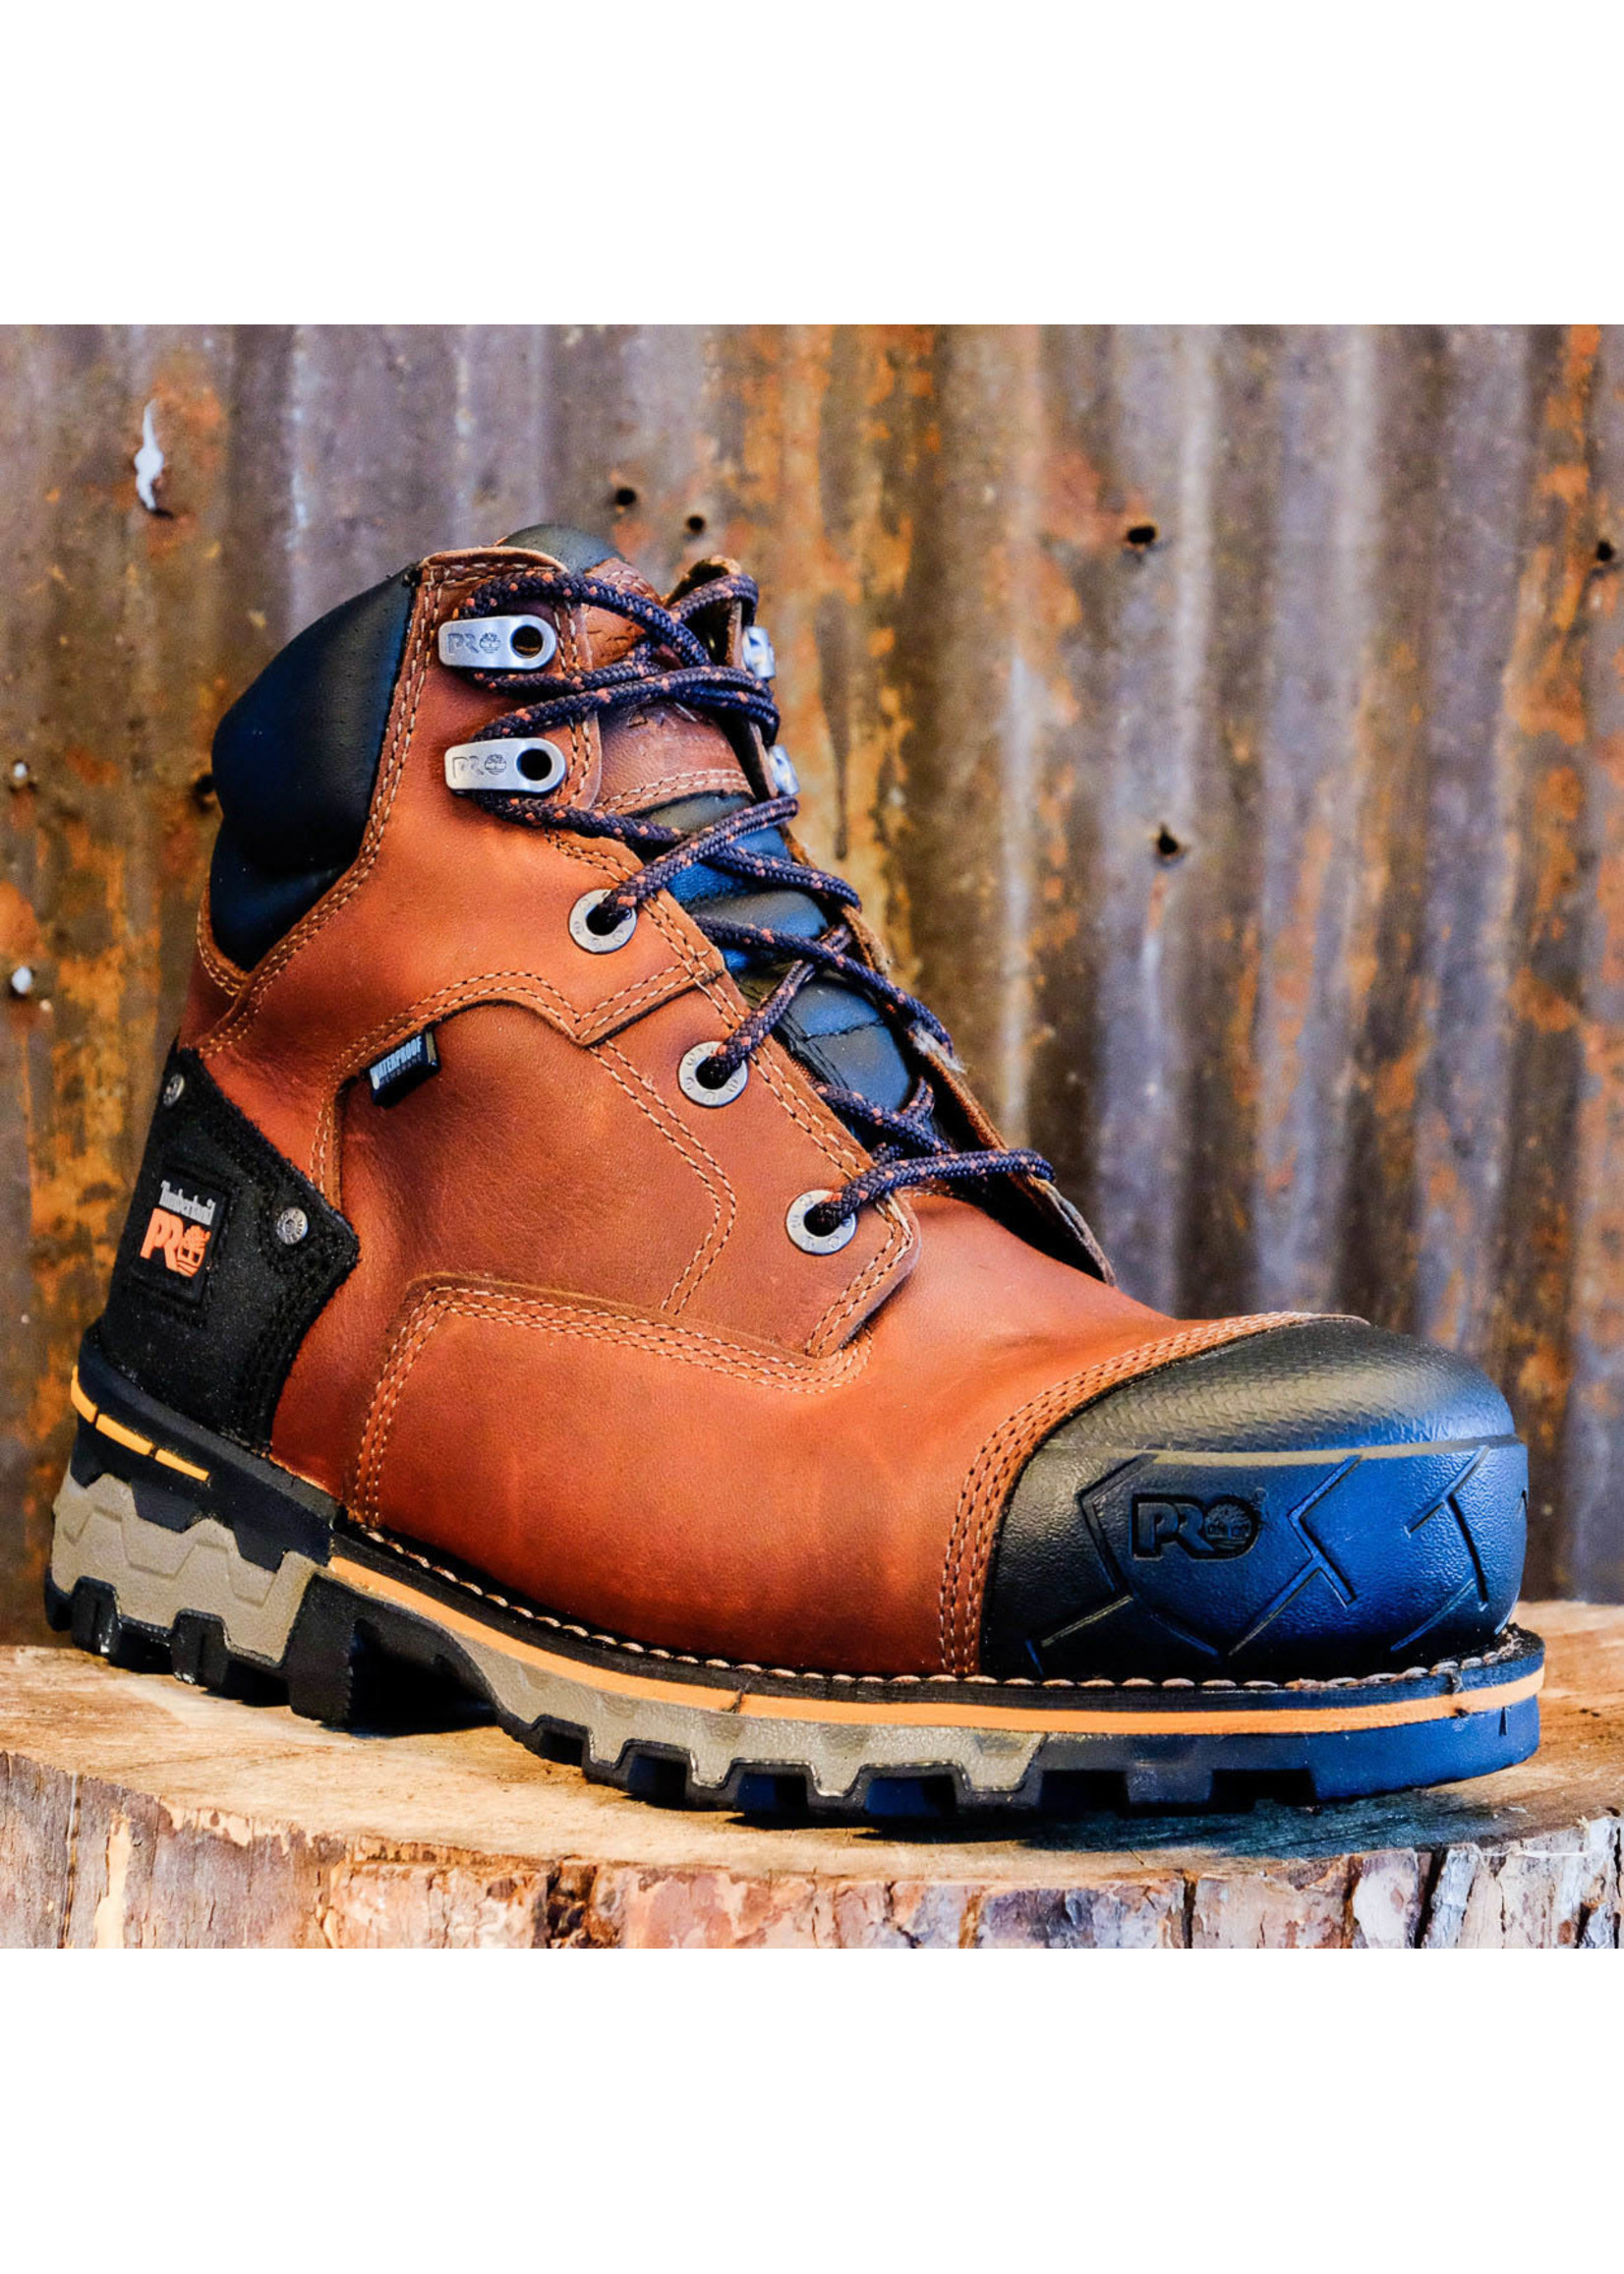 "Timberland Pro Boondock 6"" WP Soft Toe Work Boot 92673"